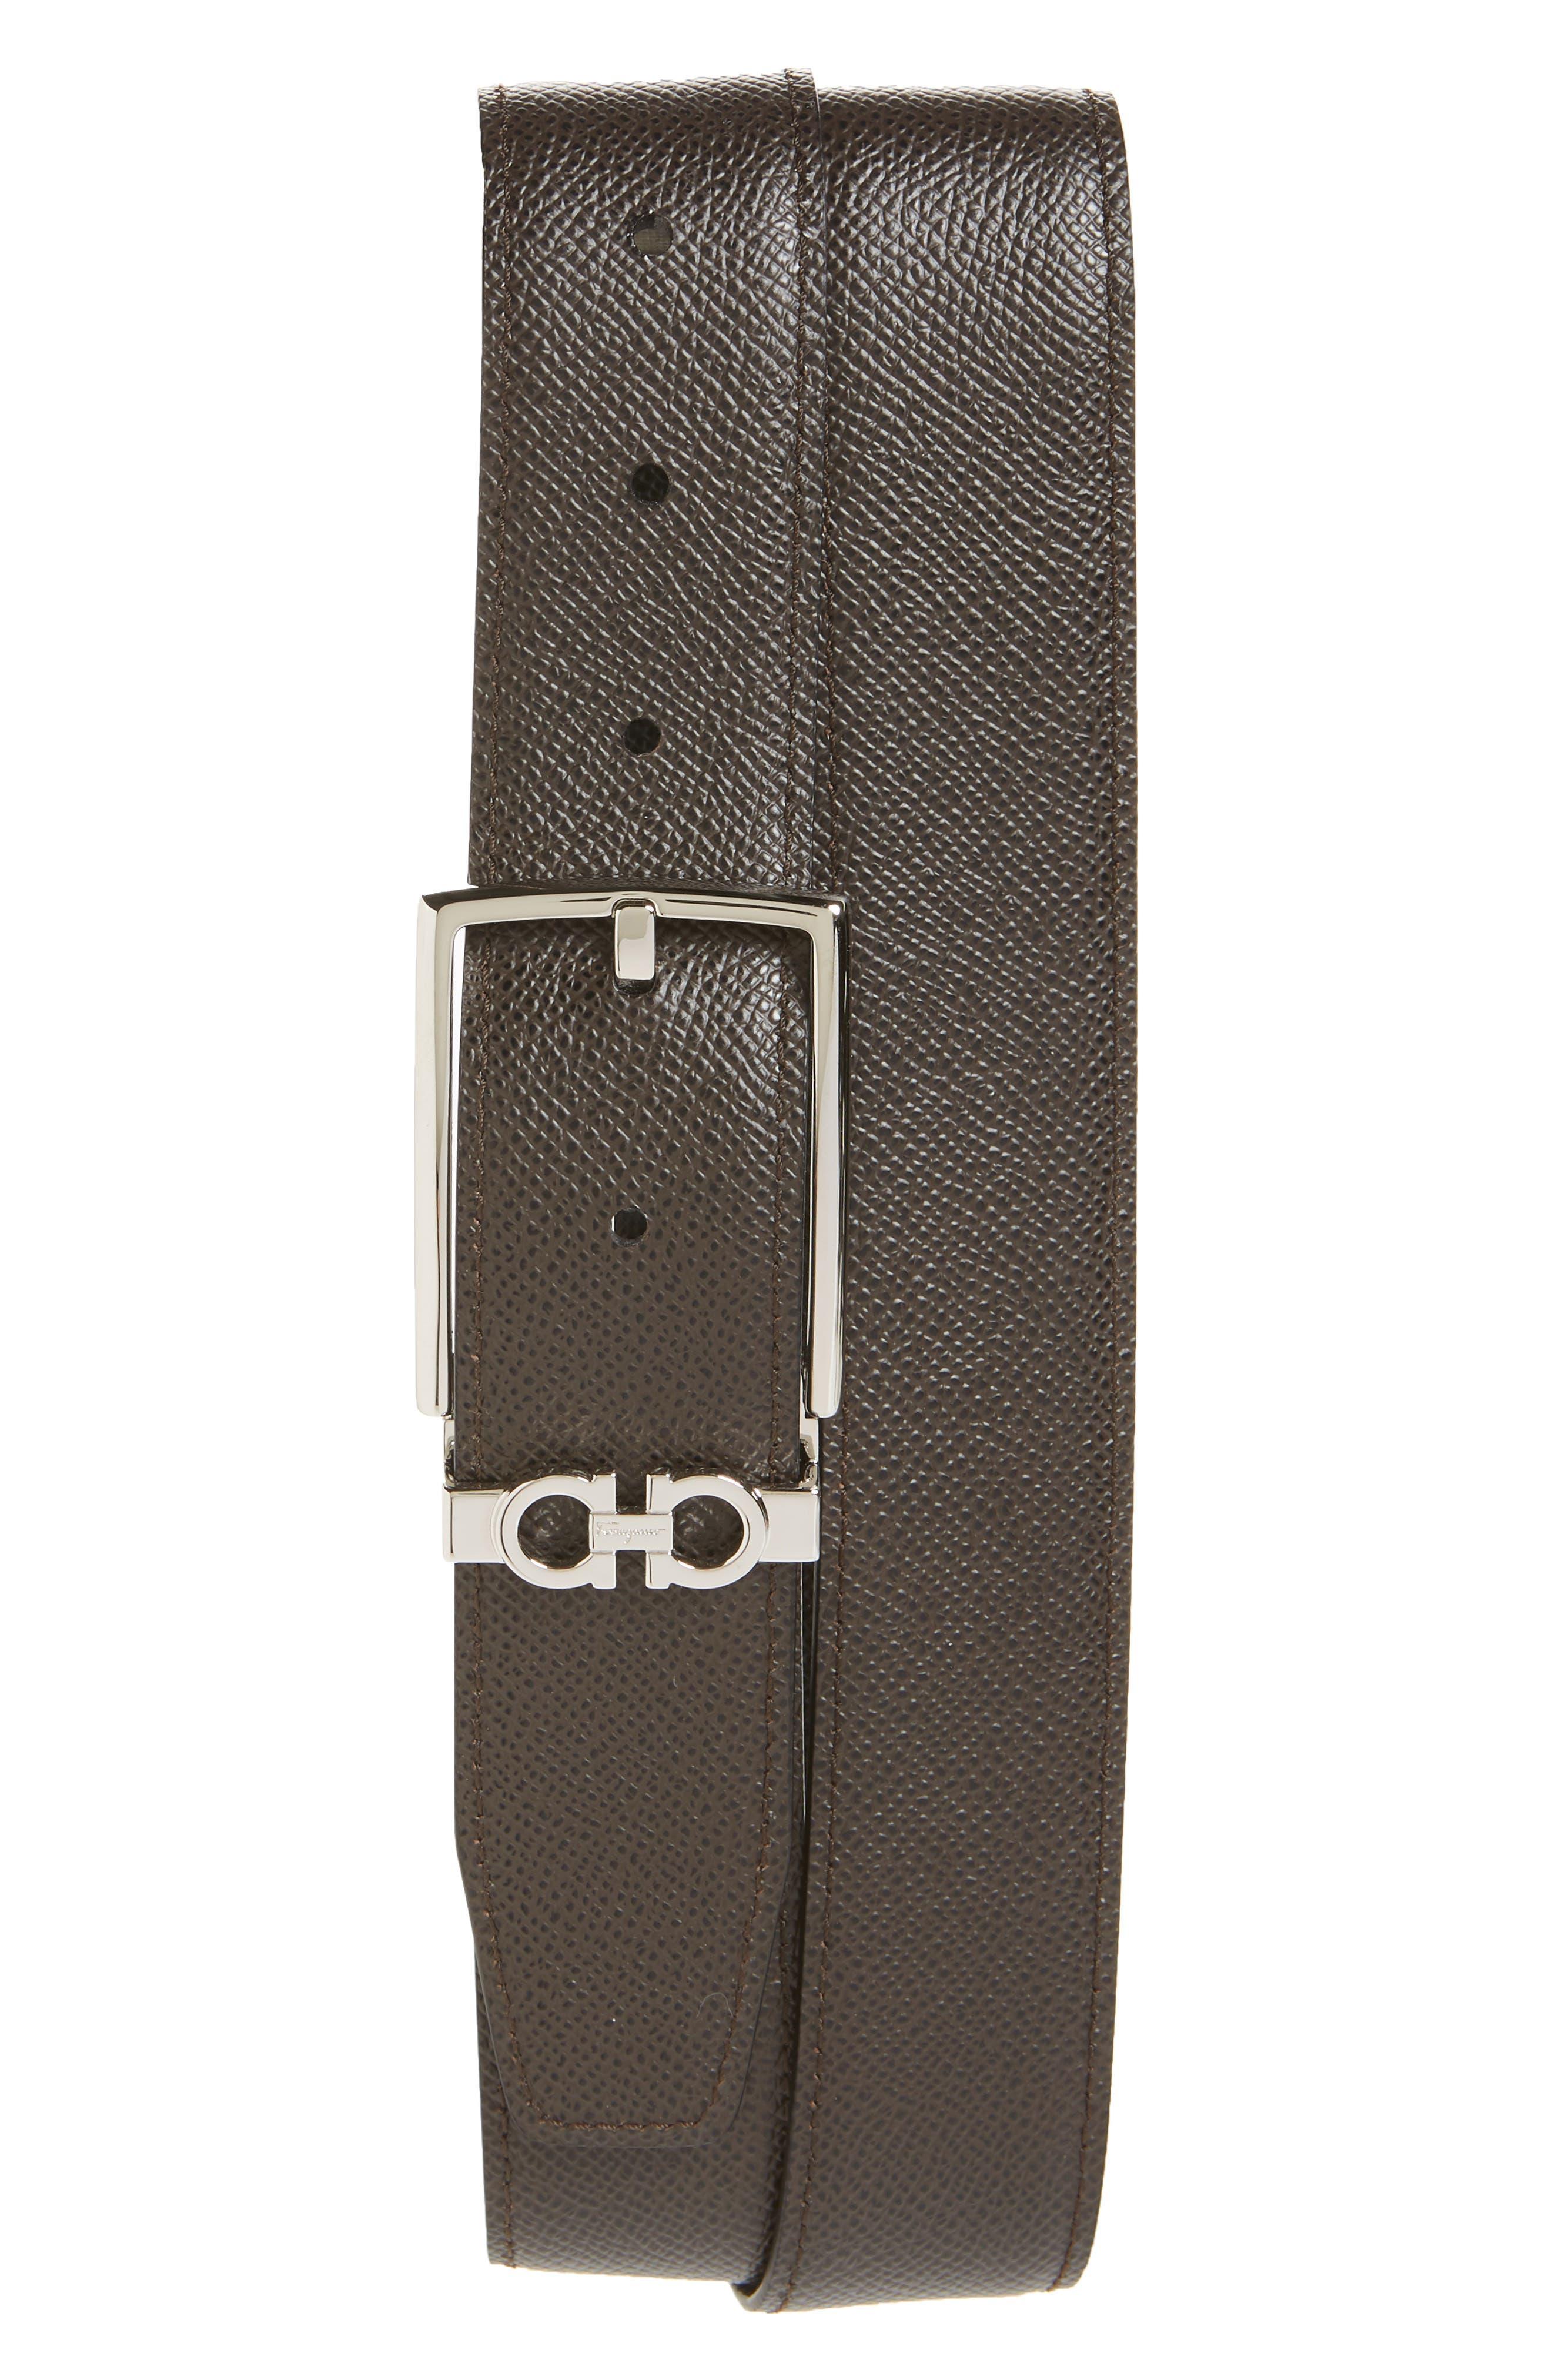 SALVATORE FERRAGAMO, Reversible Leather Belt, Alternate thumbnail 2, color, NERO / T.MORO